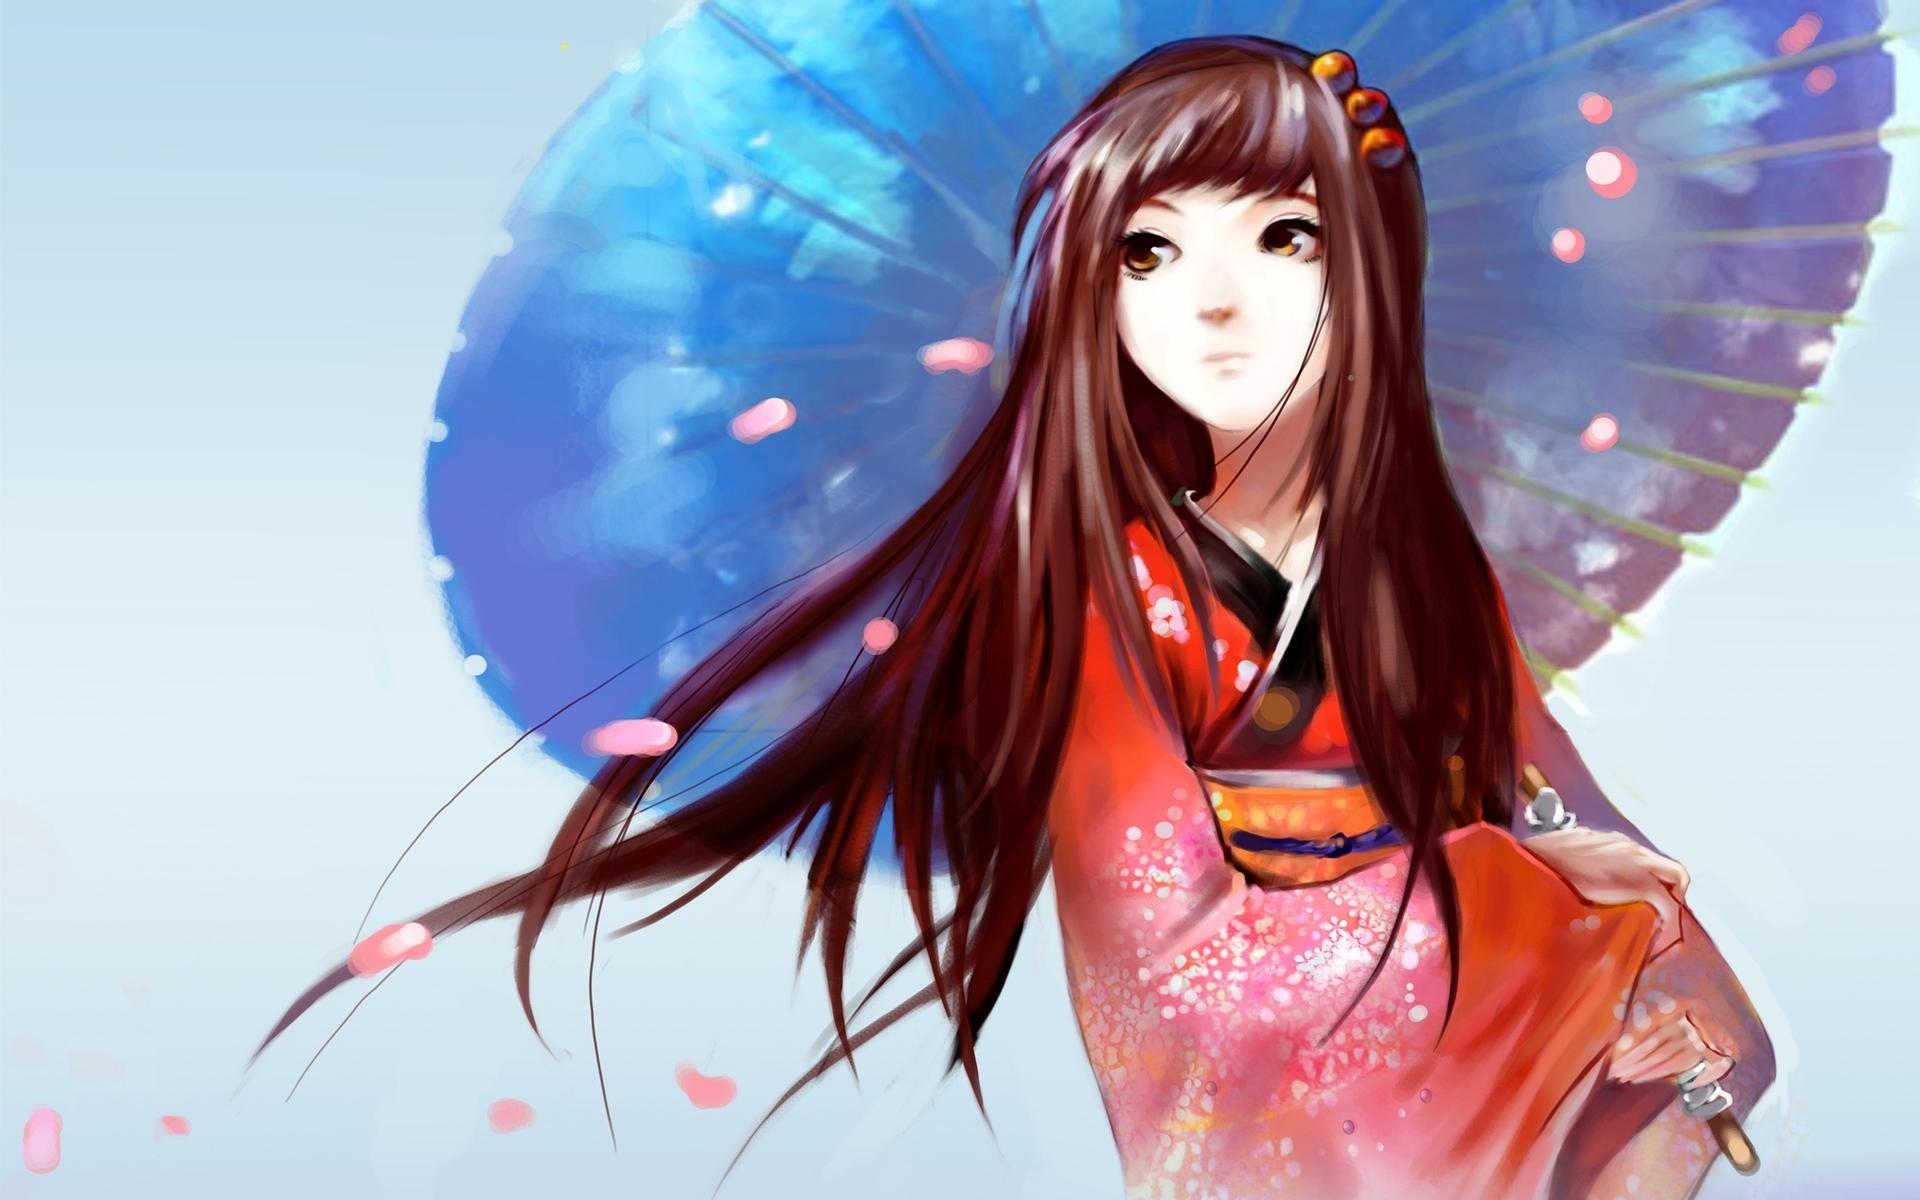 Japanese Anime Girl Umbrella